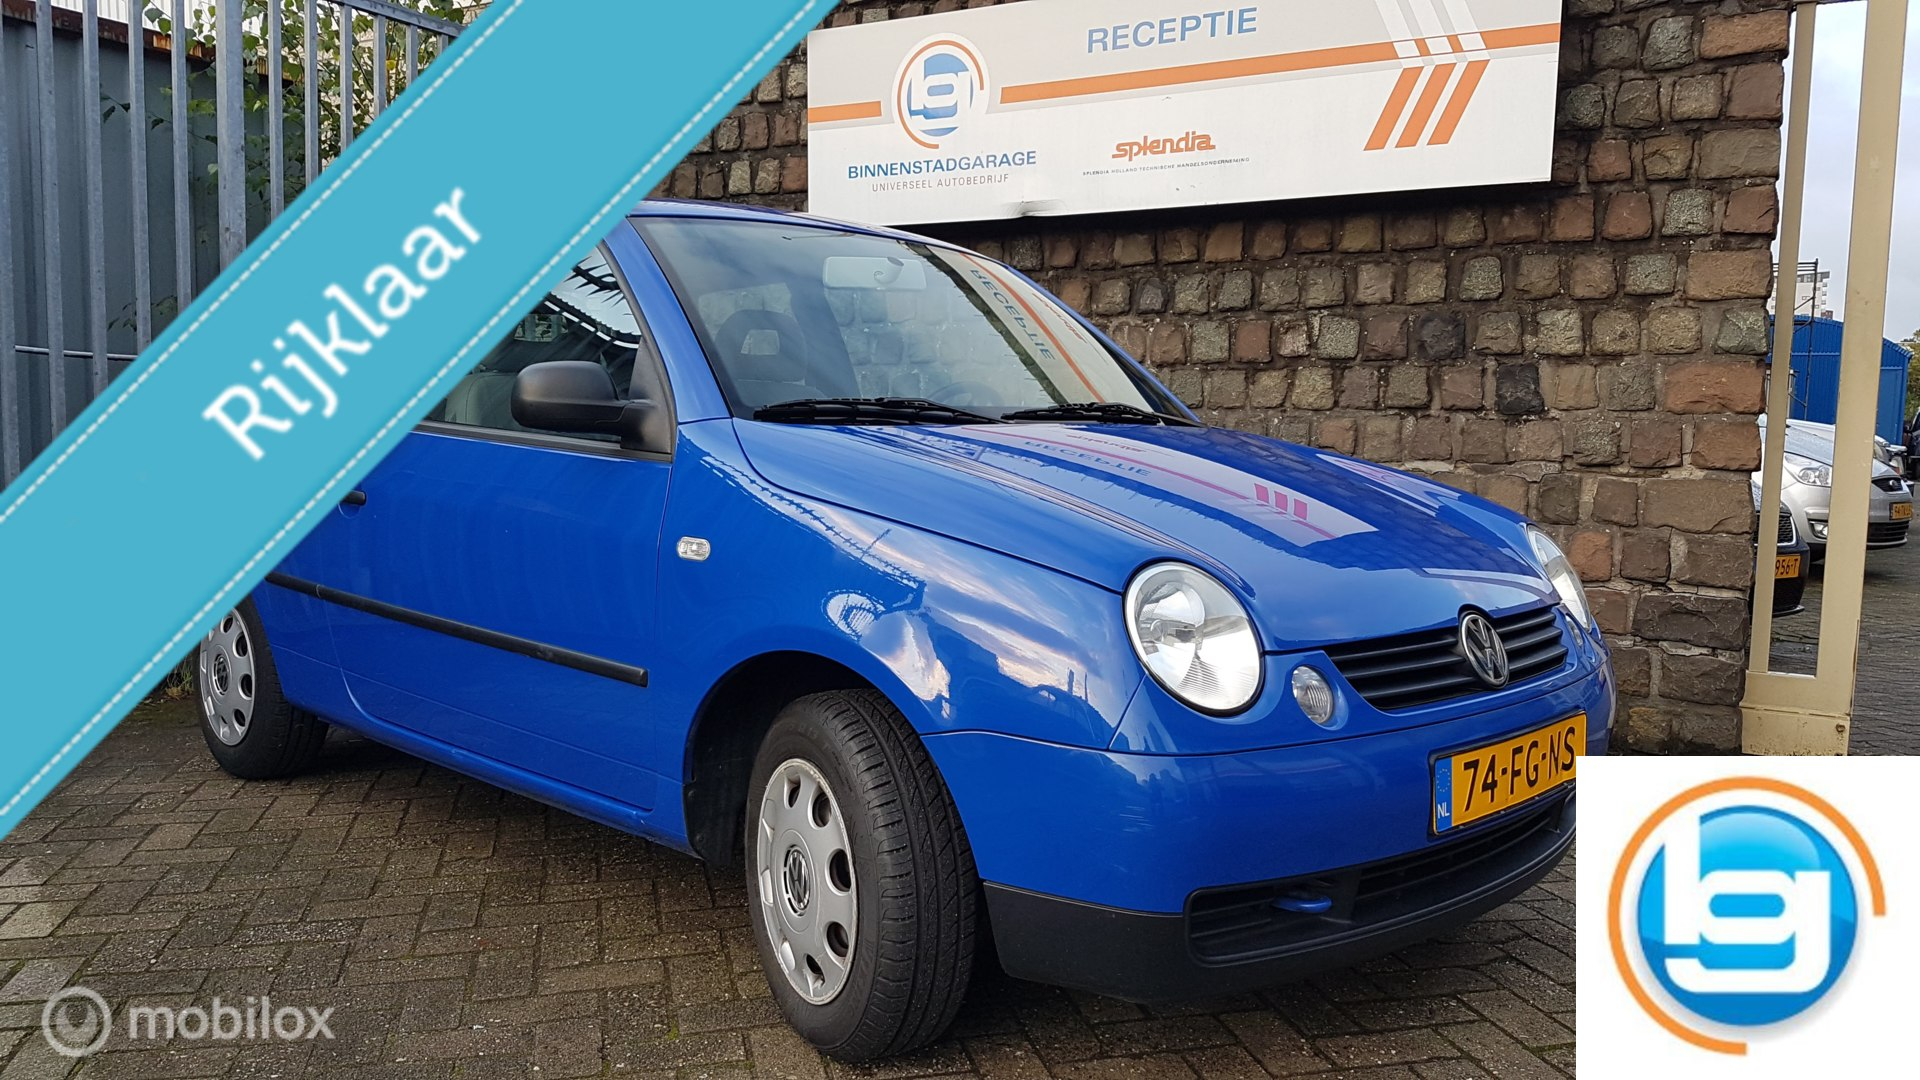 Volkswagen Lupo 1.4-16V